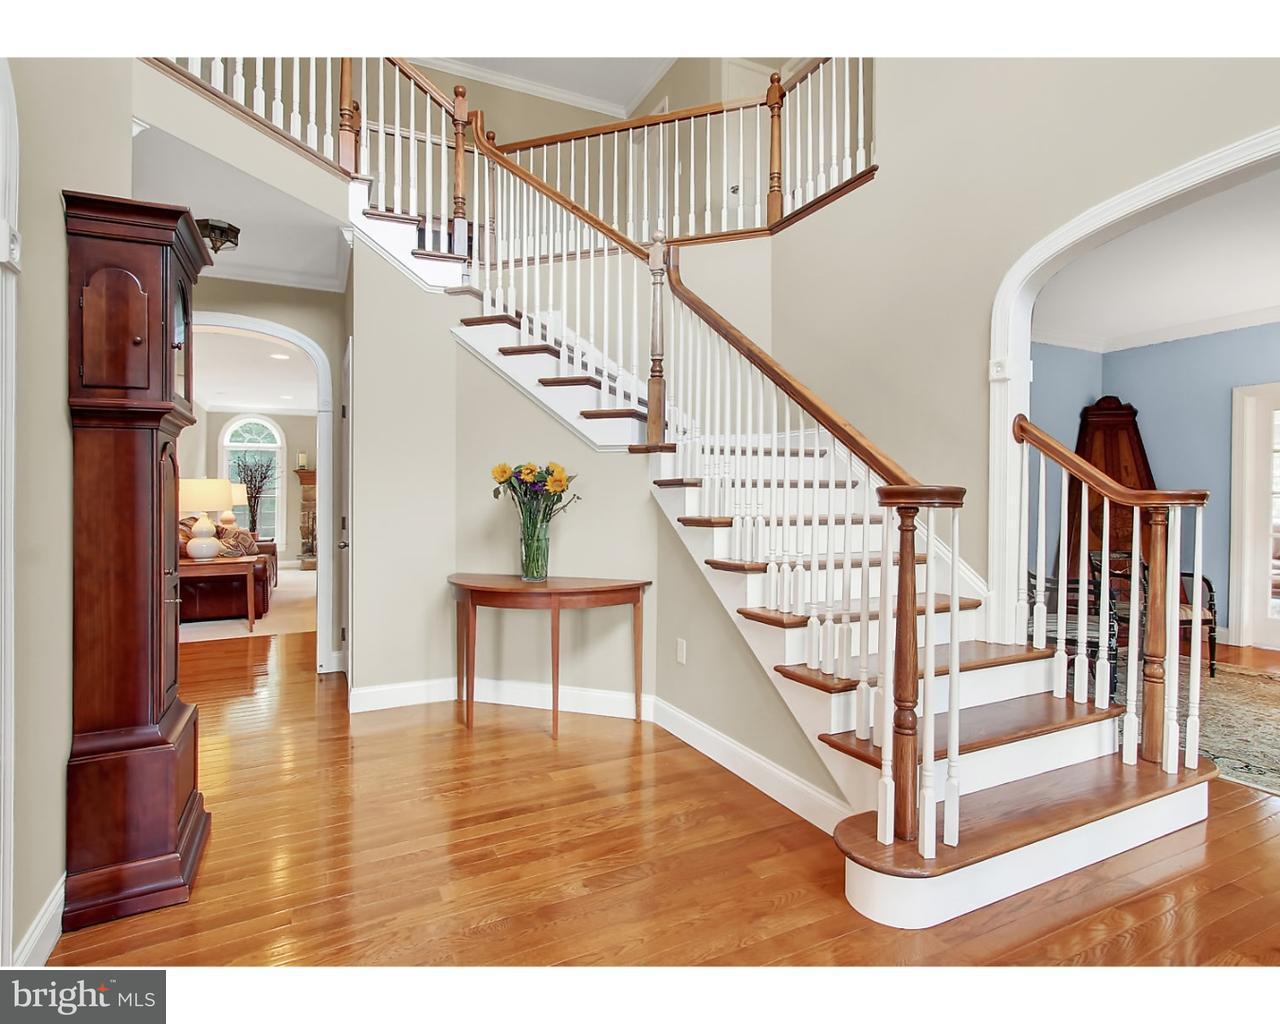 404 QUAKER HILL RD, MORGANTOWN - Listed at $549,000, MORGANTOWN